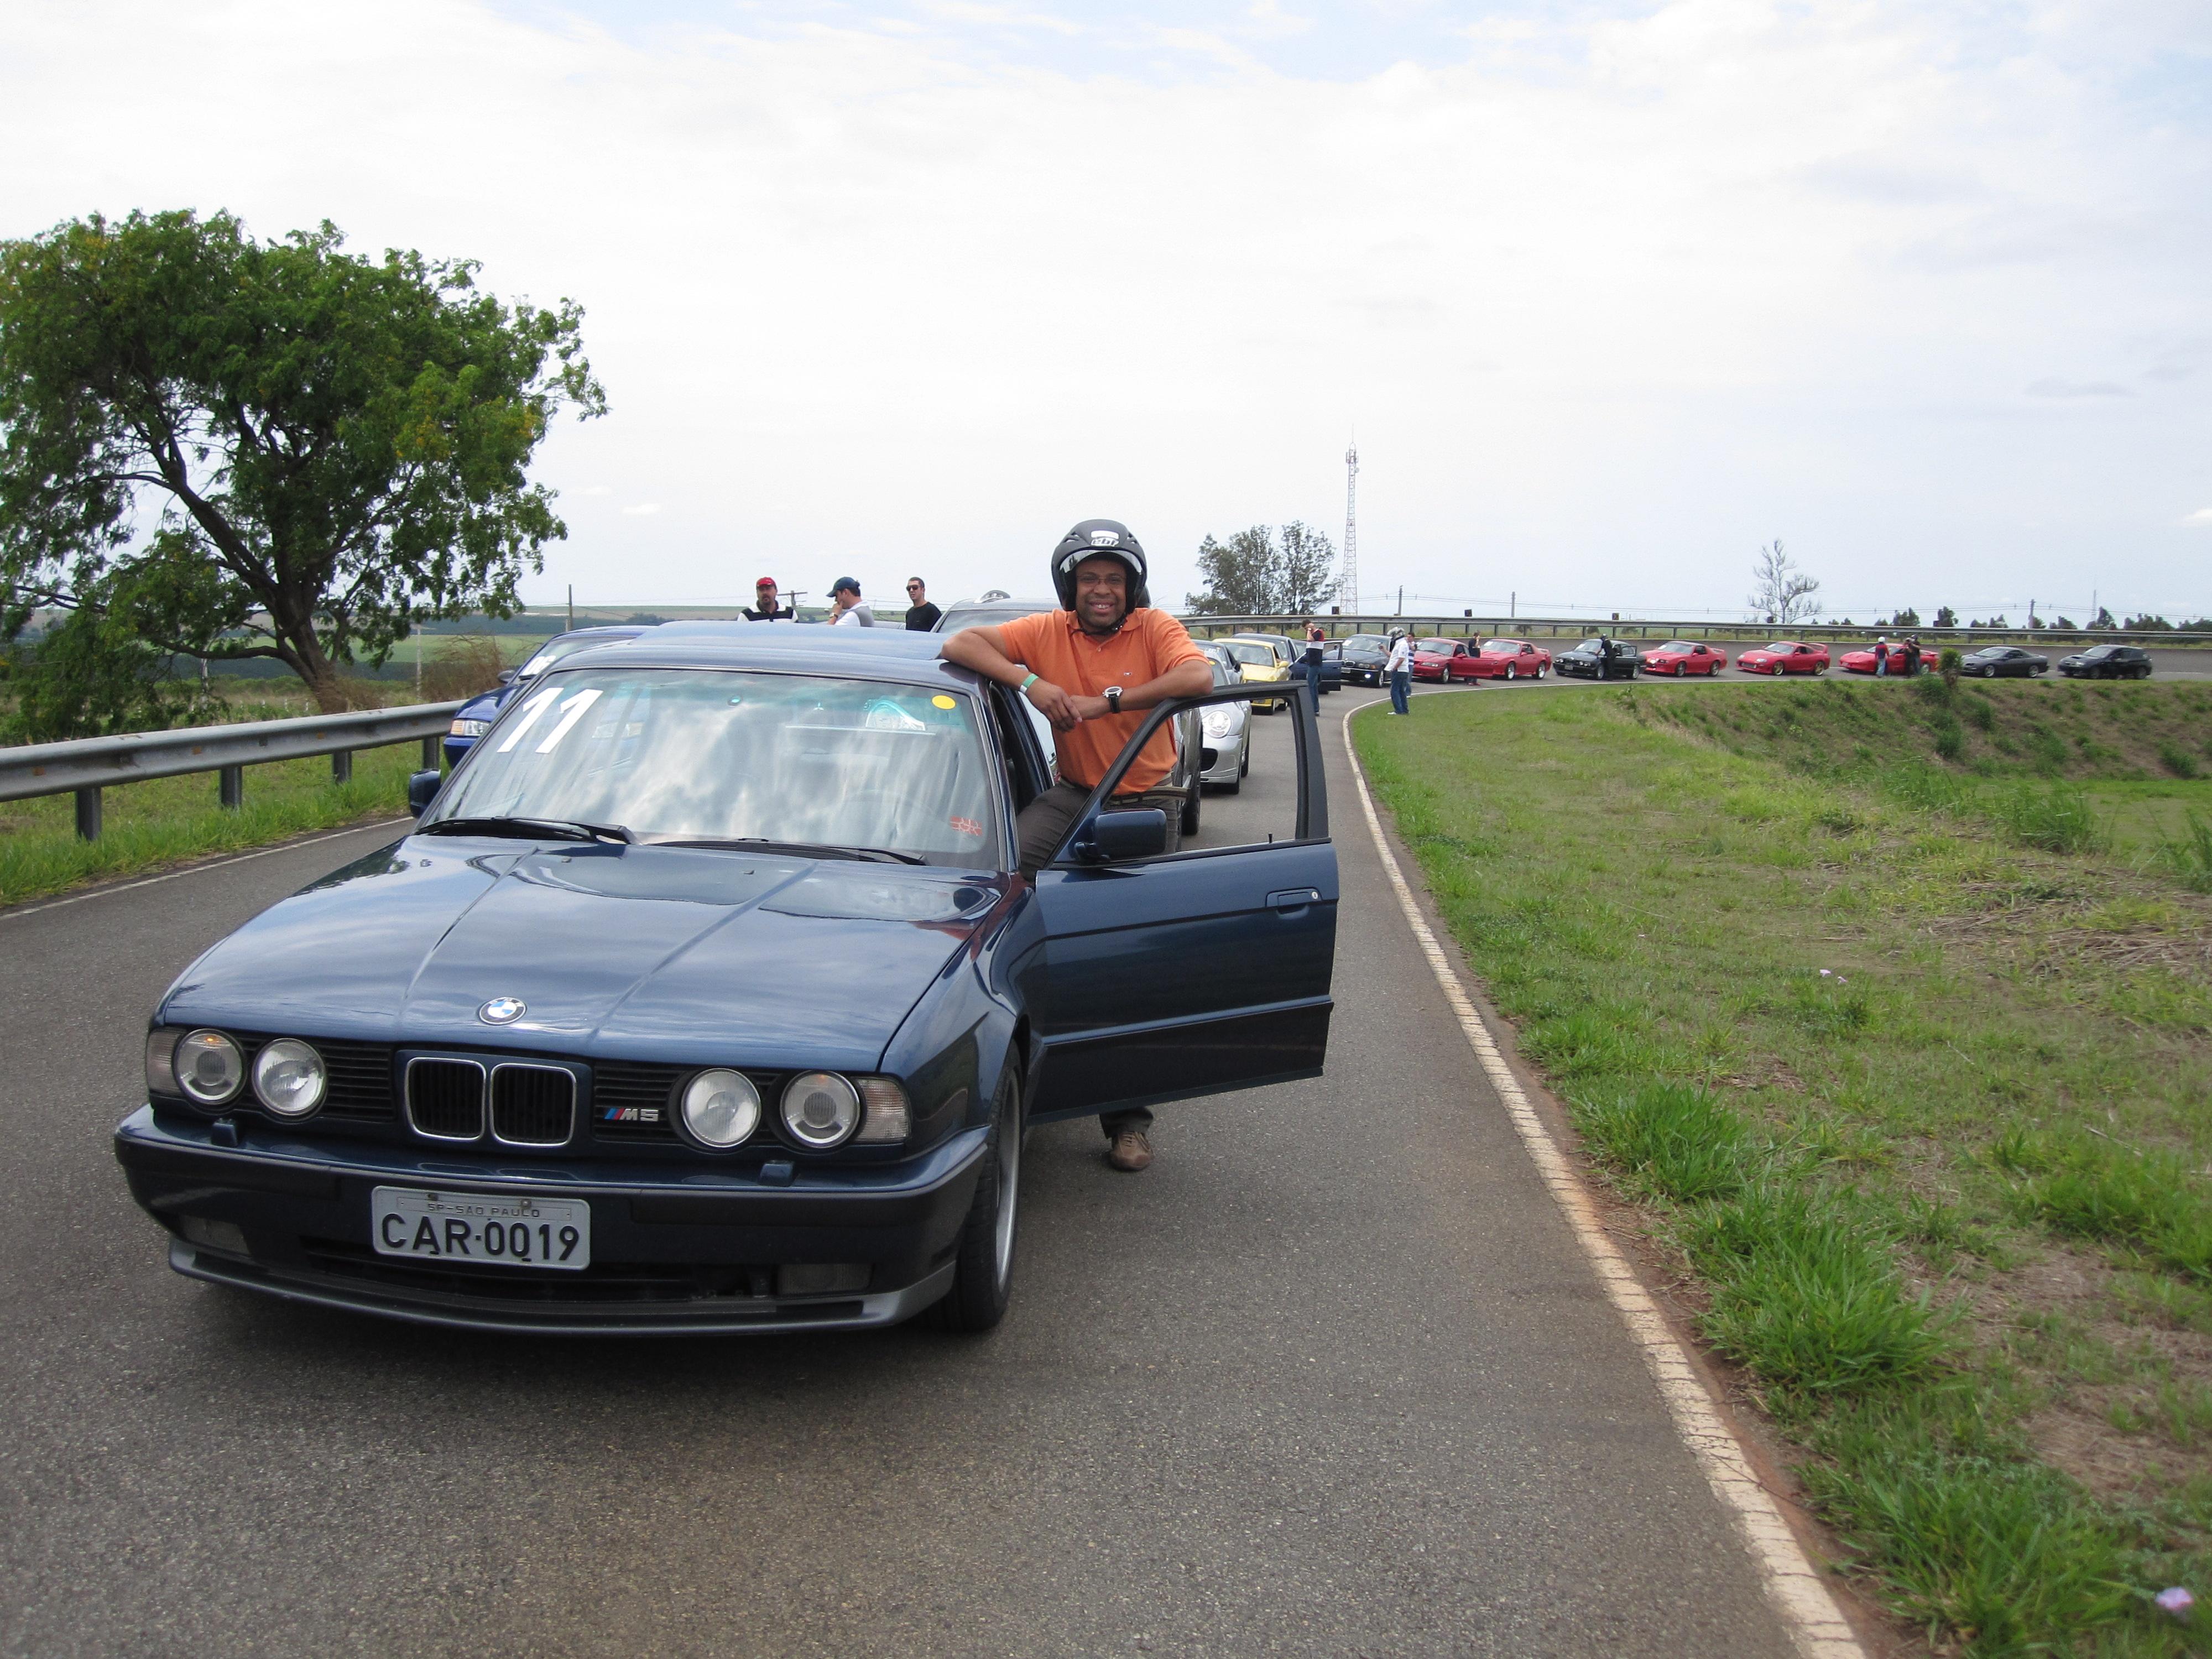 Driver TRW